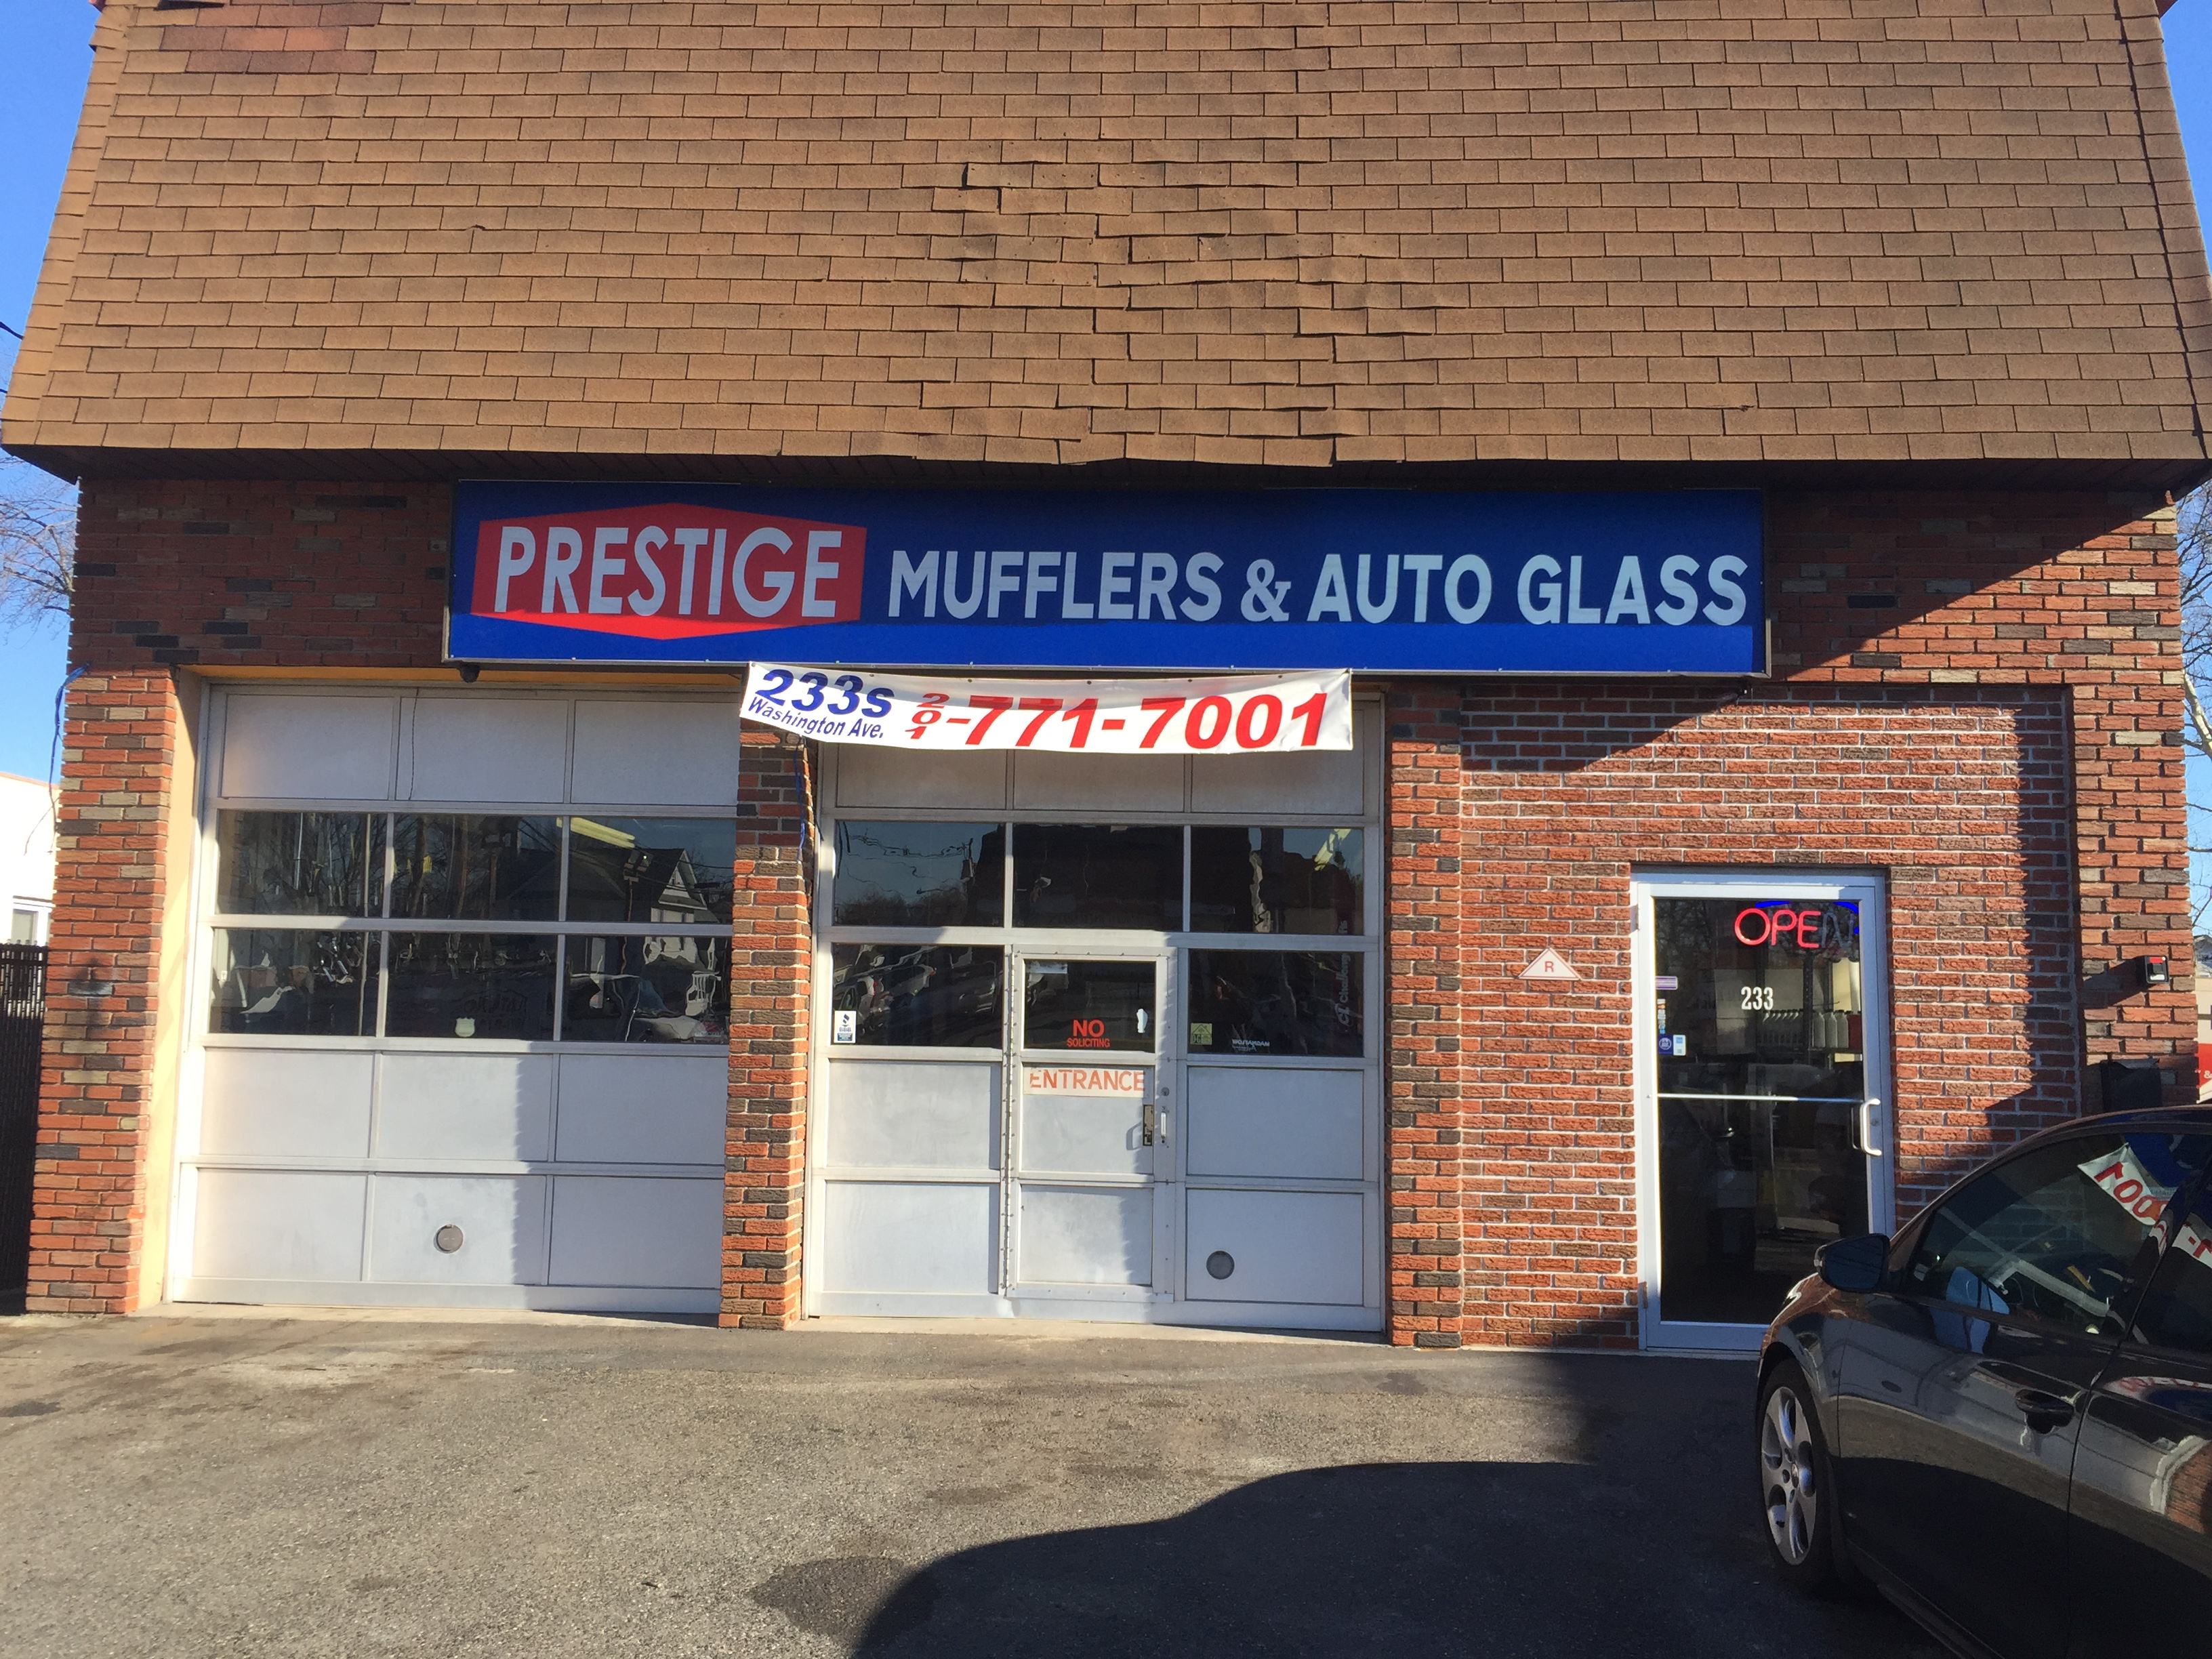 Prestige Mufflers 233 S Washington Ave, Bergenfield